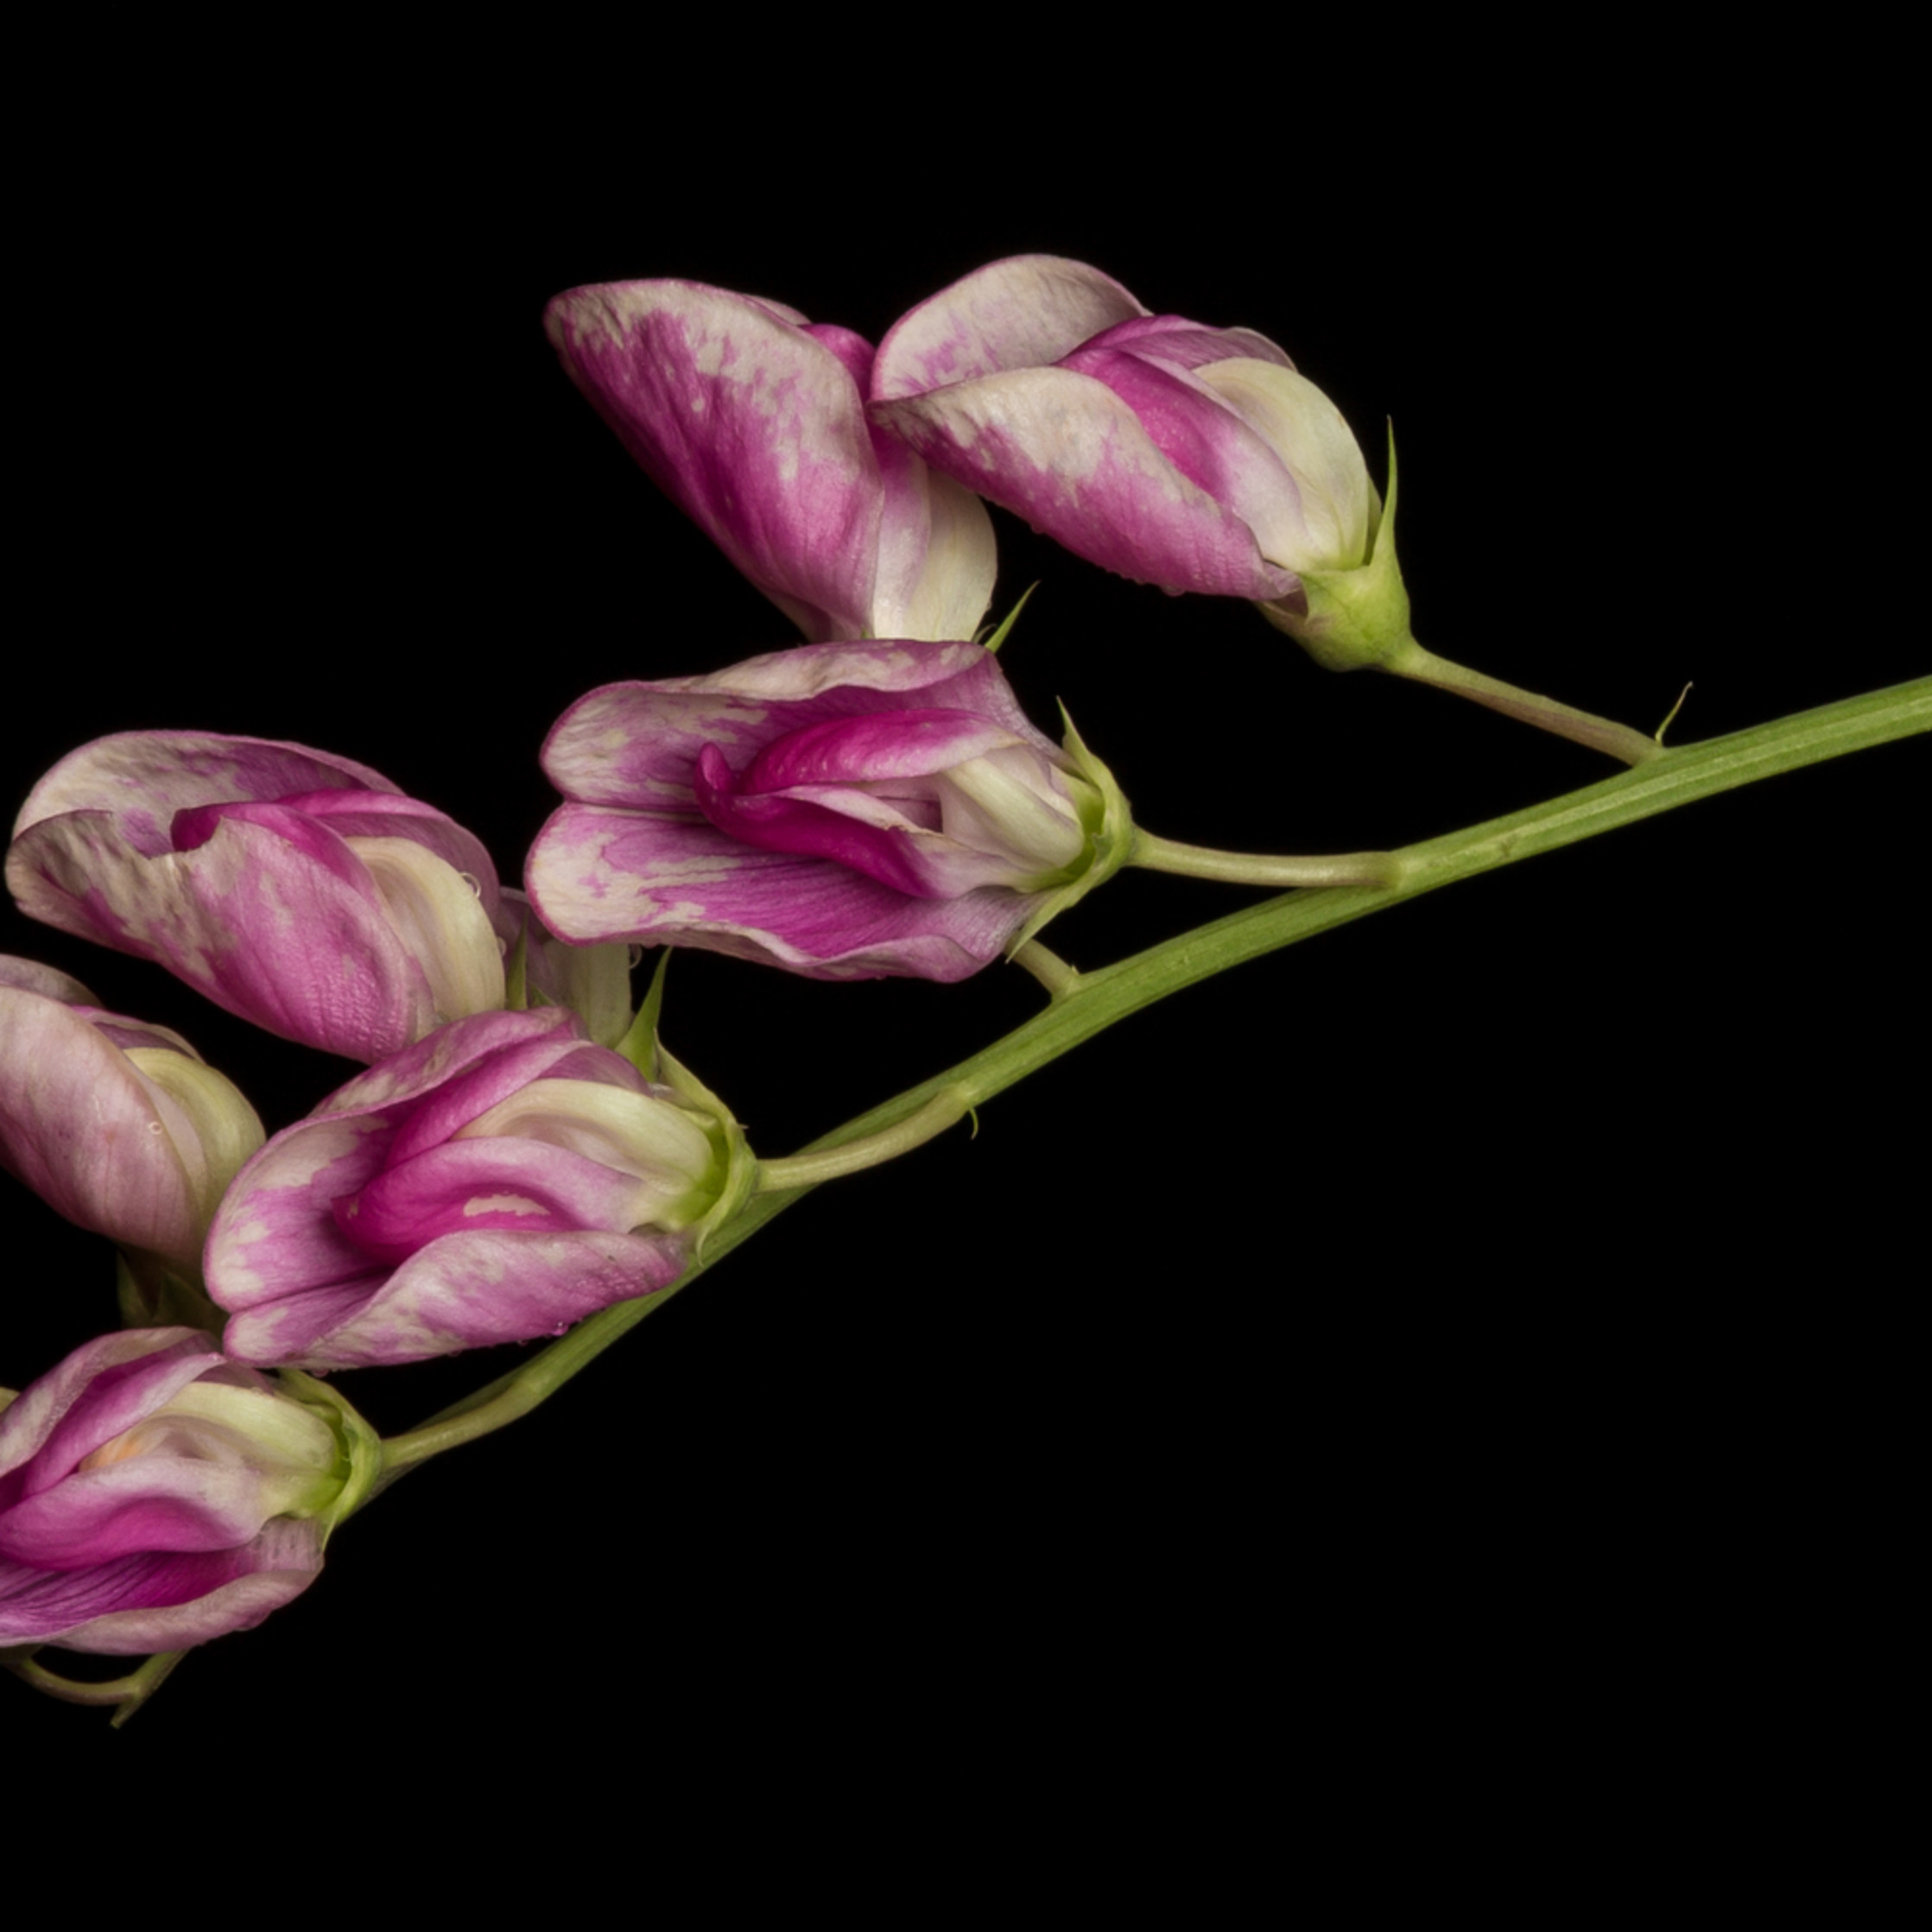 Invasive beauty perennial pea lathyrus latifolius bvykgh